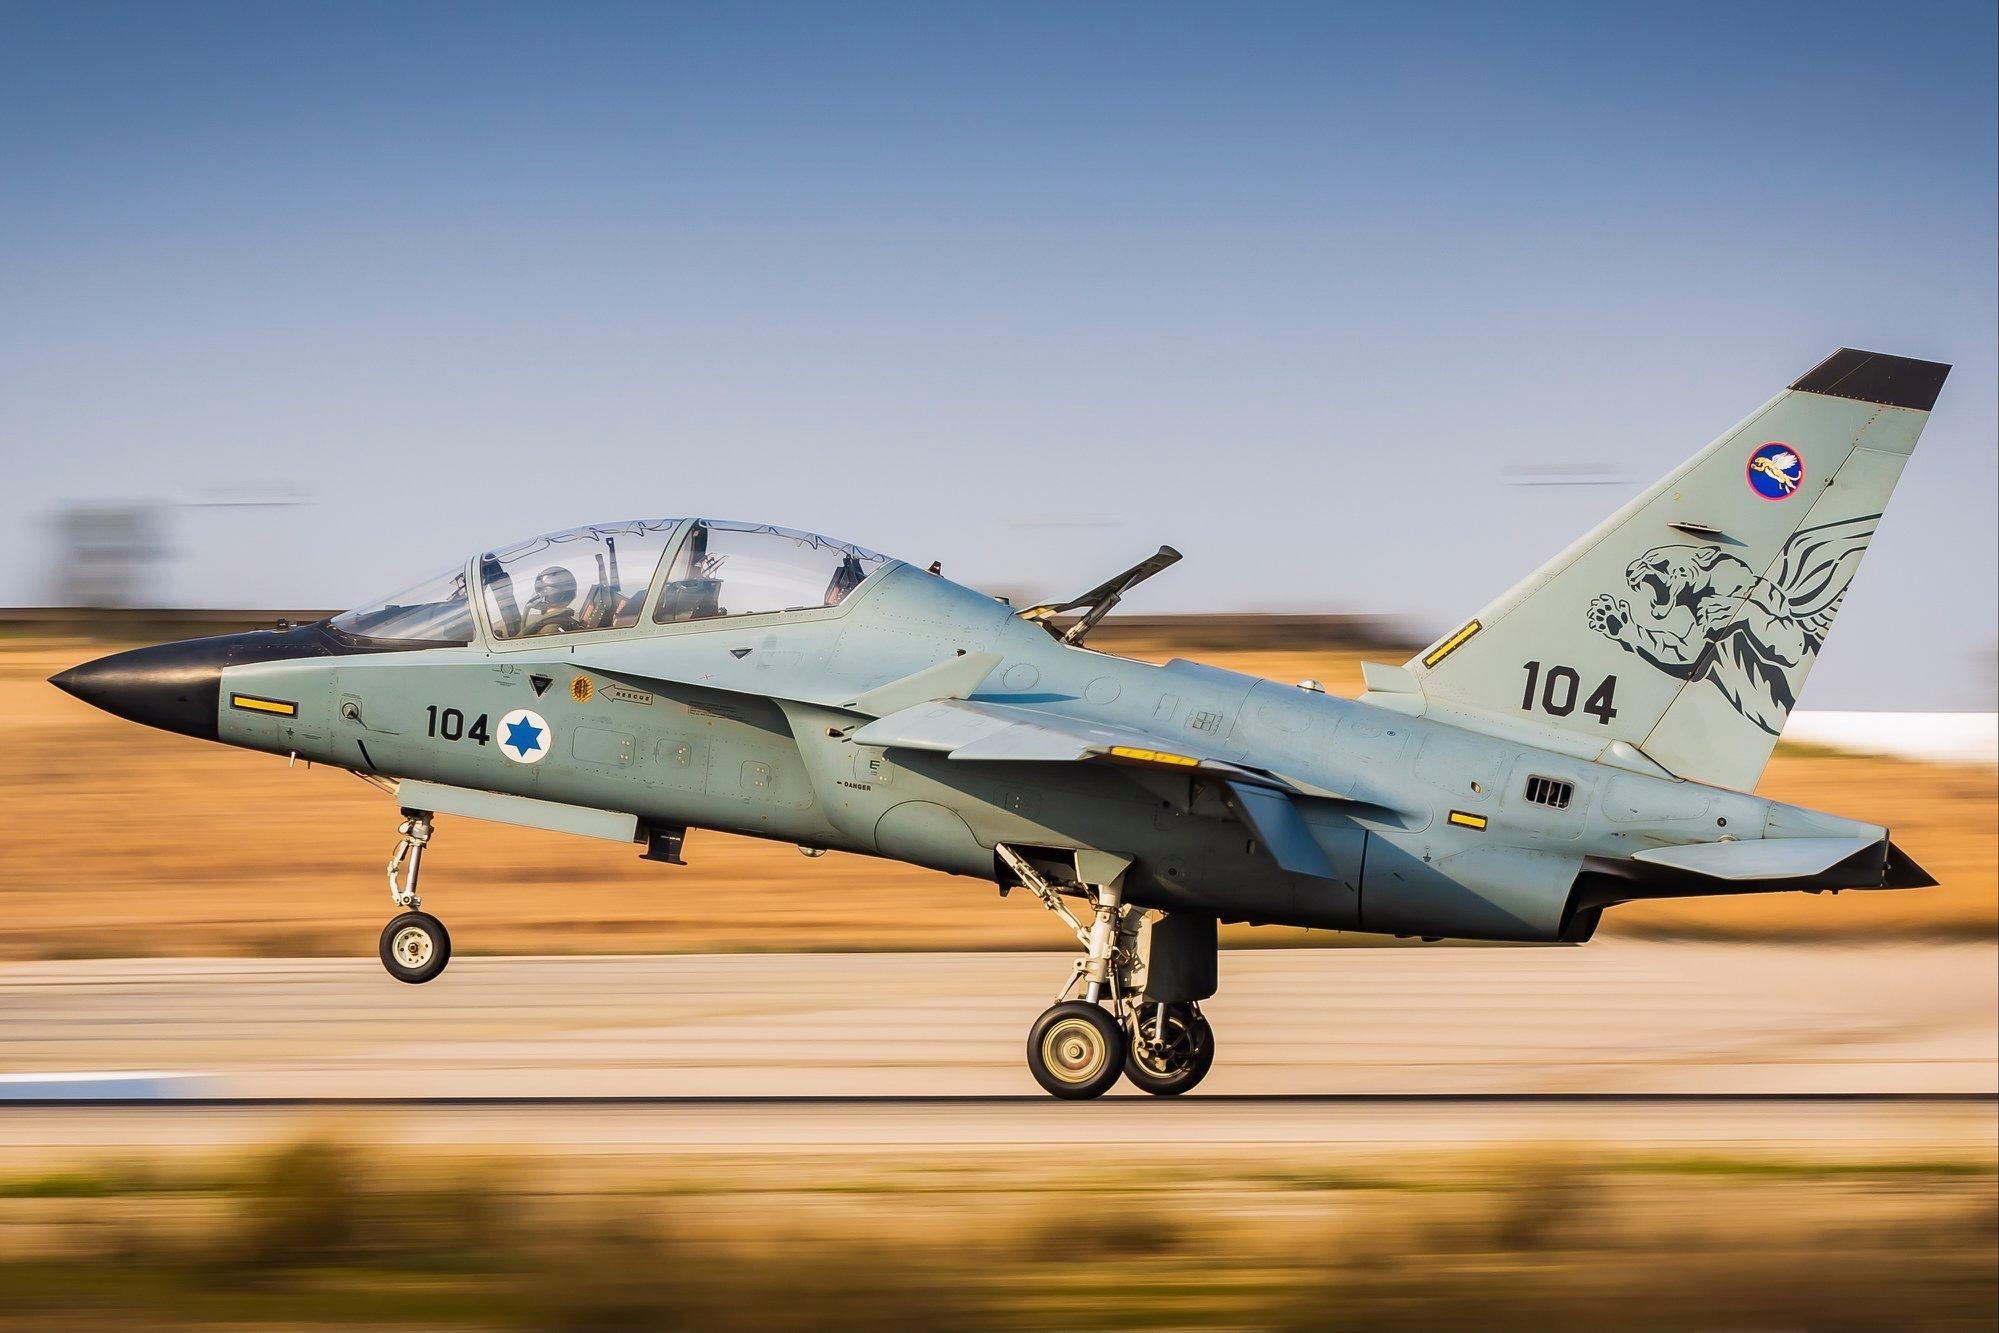 M-346 Lavi [Israeli Air Force]